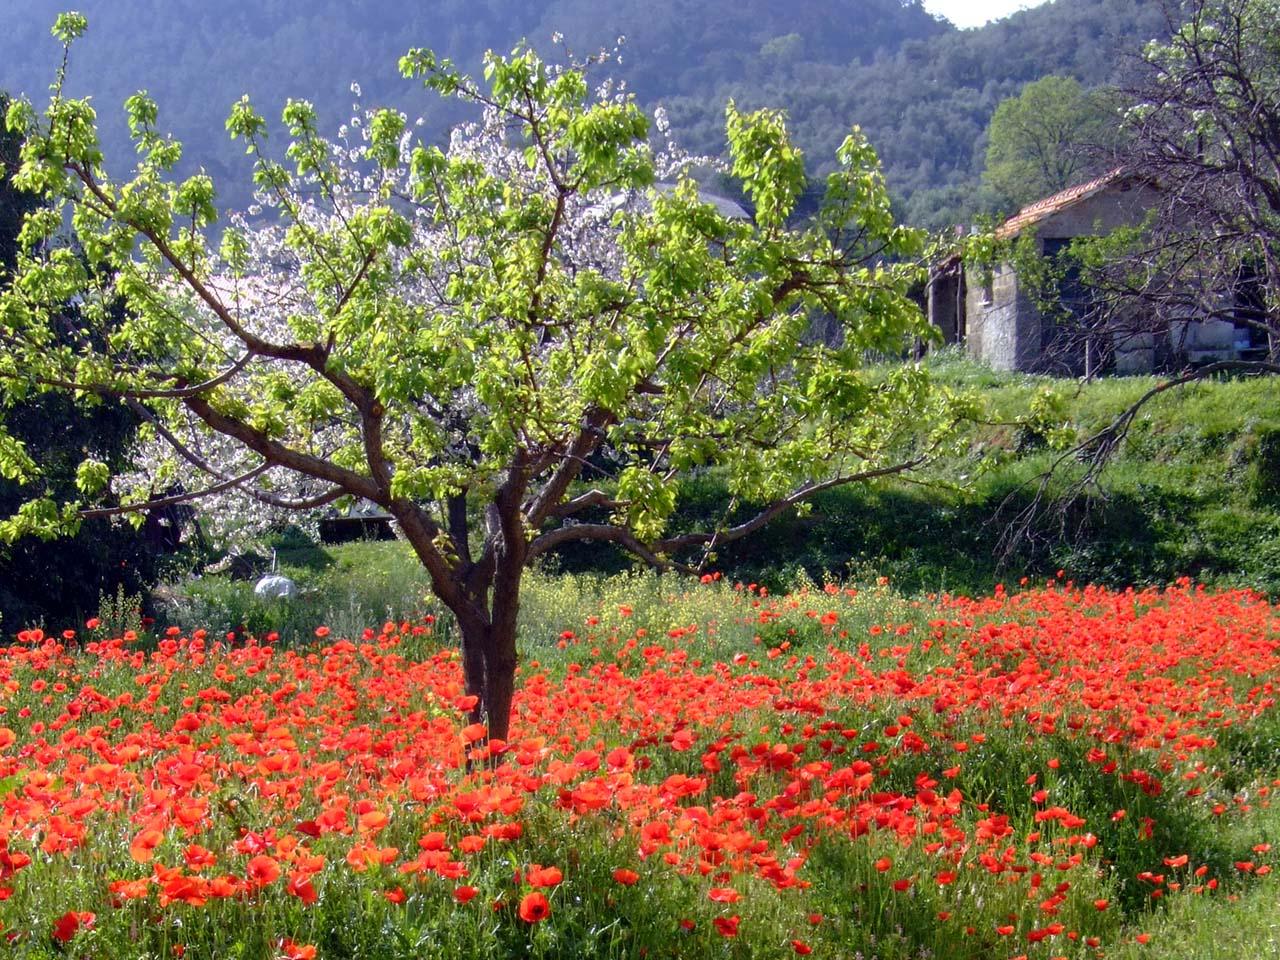 Free beautiful spring scenic wallpaper wallpapersafari - Backgrounds springtime ...